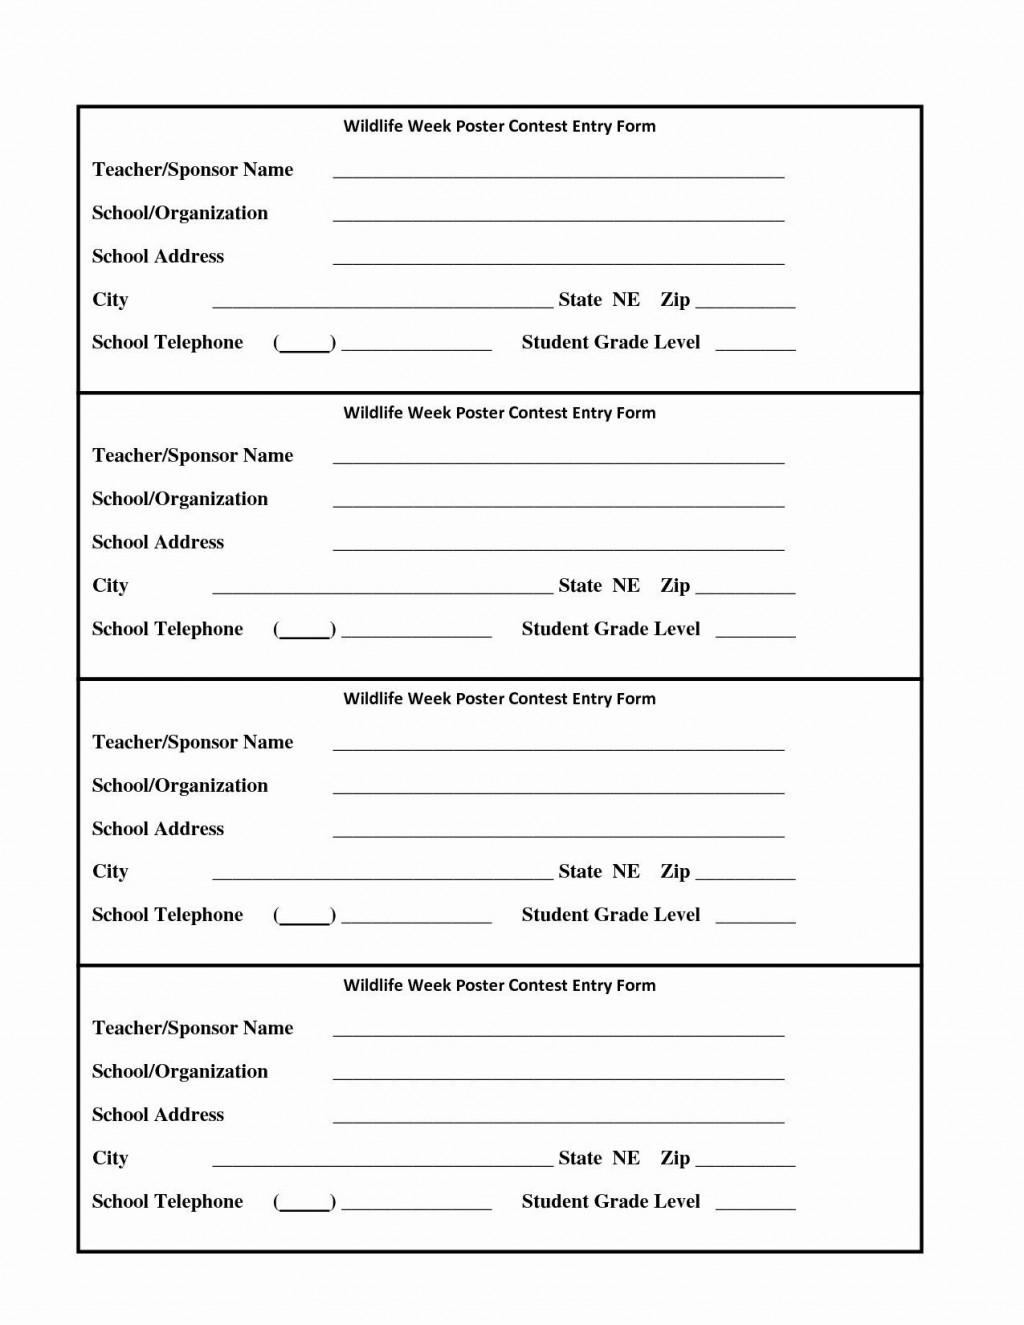 009 Incredible Entry Form Template Word Photo  Raffle Data MicrosoftLarge